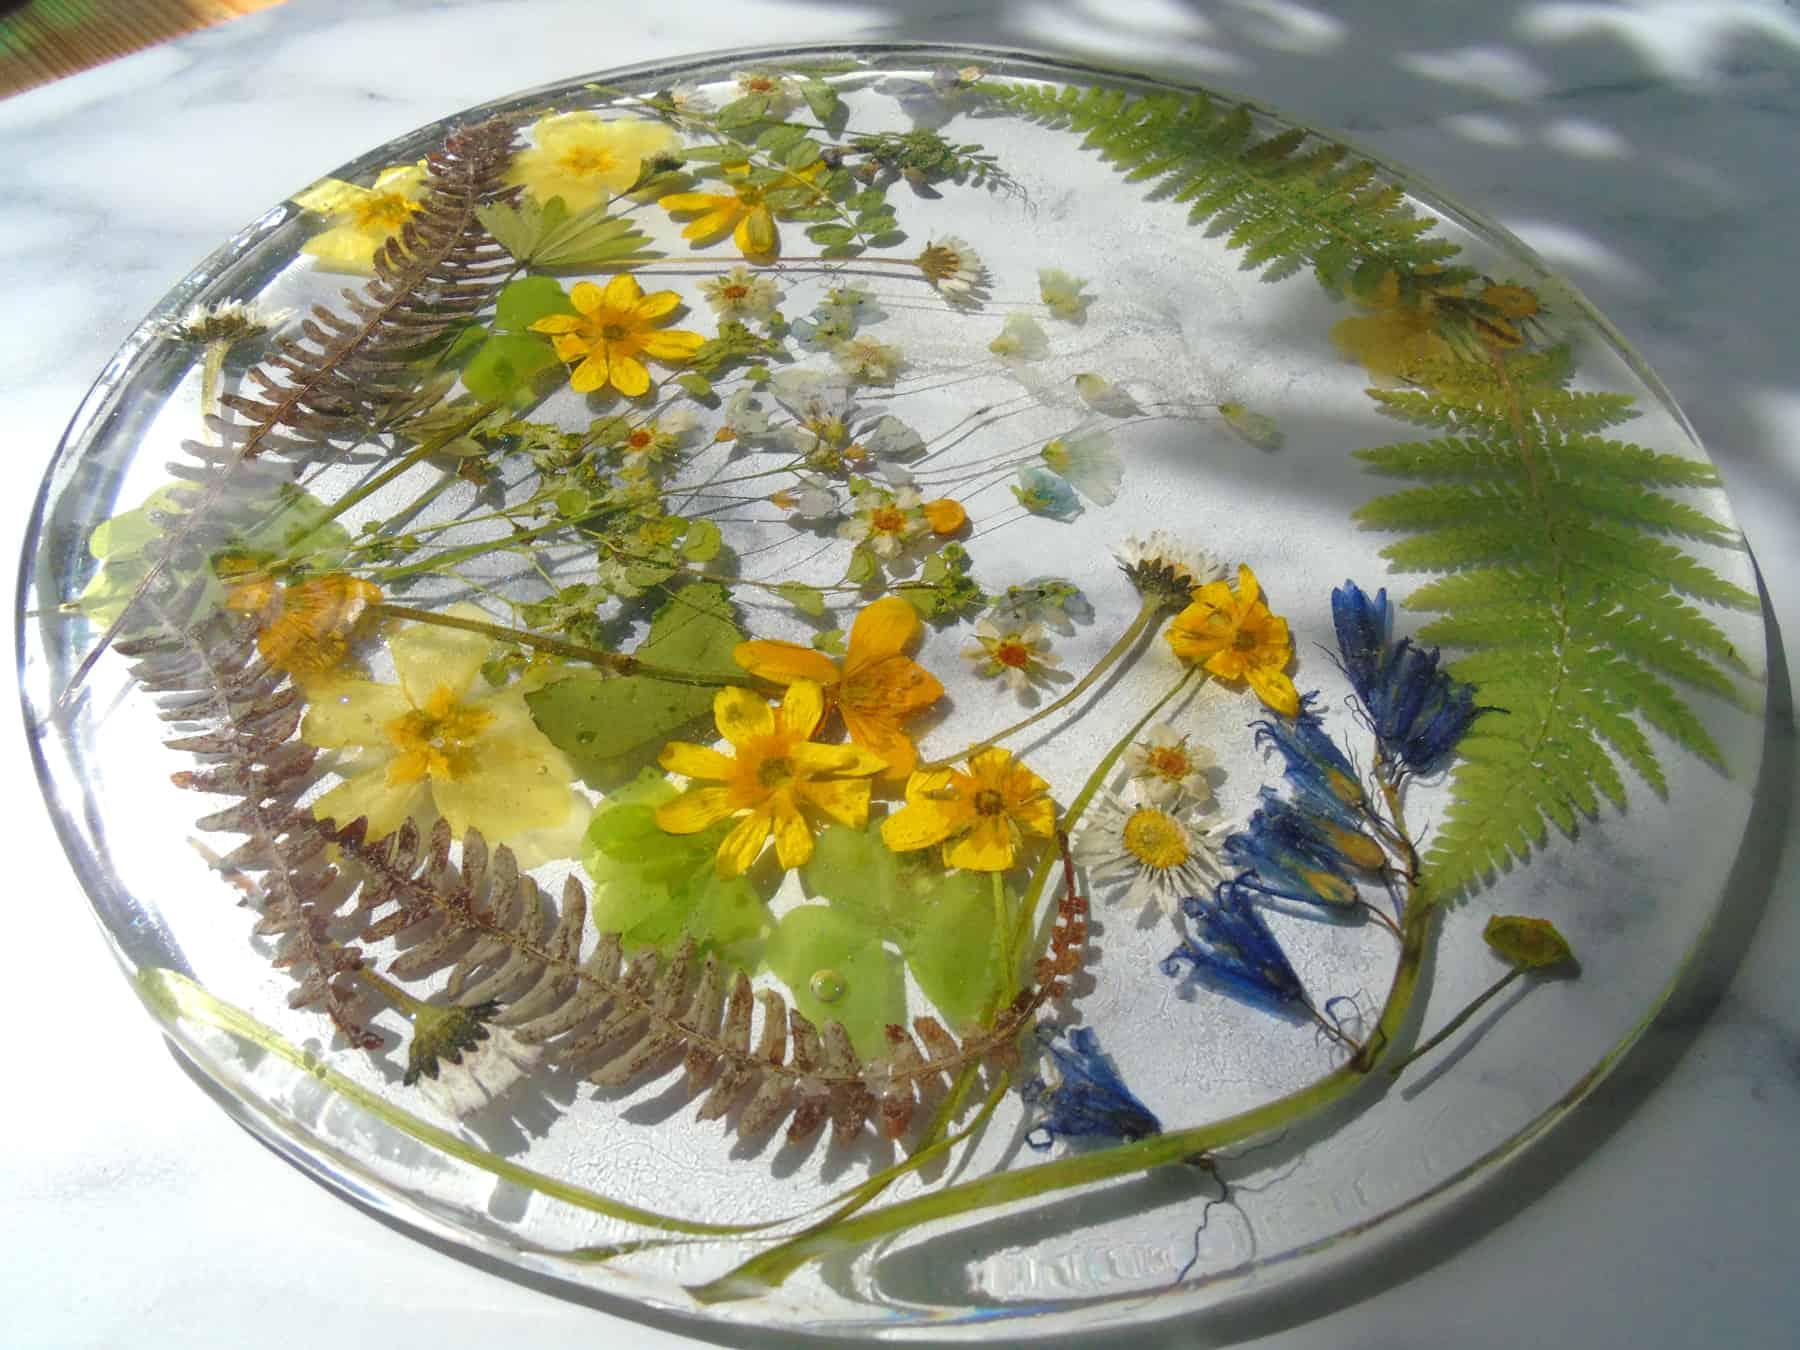 Wildflowers of Mull resin coaster